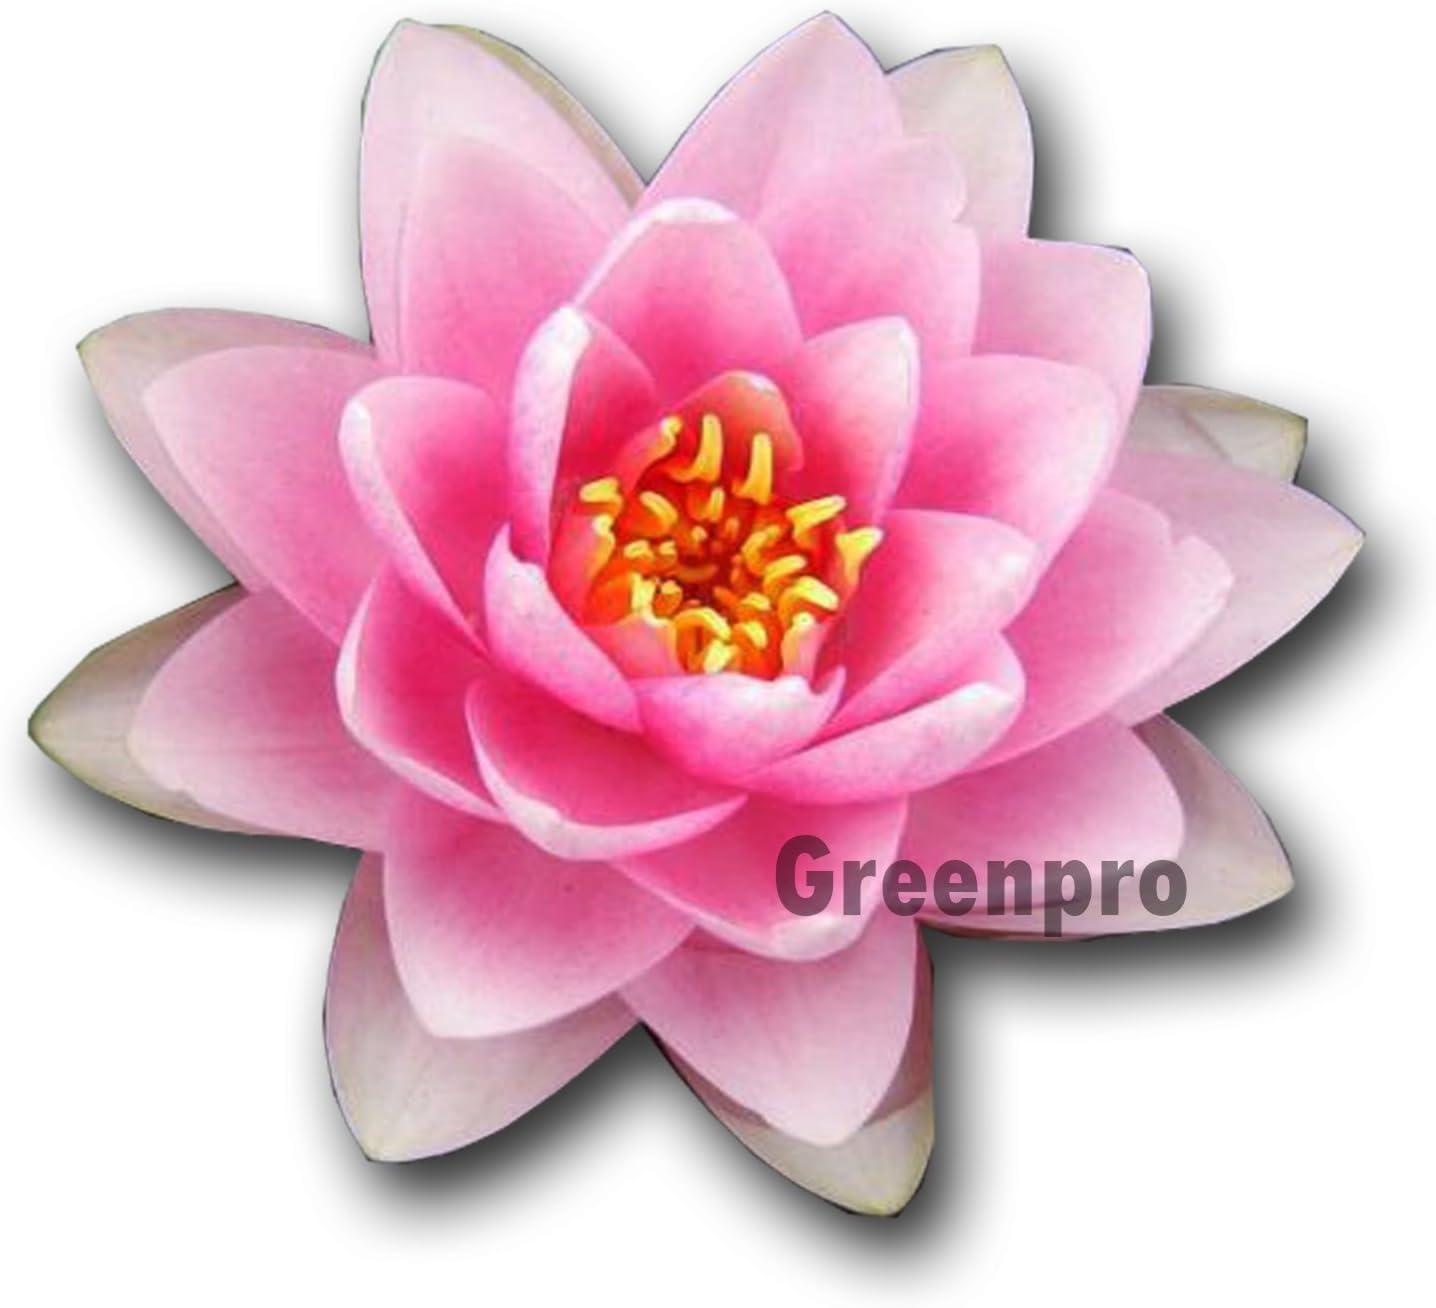 Live Aquatic Plant Nymphaea Madame Water Lady Under blast Under blast sales sales Lilies Hardy Pink